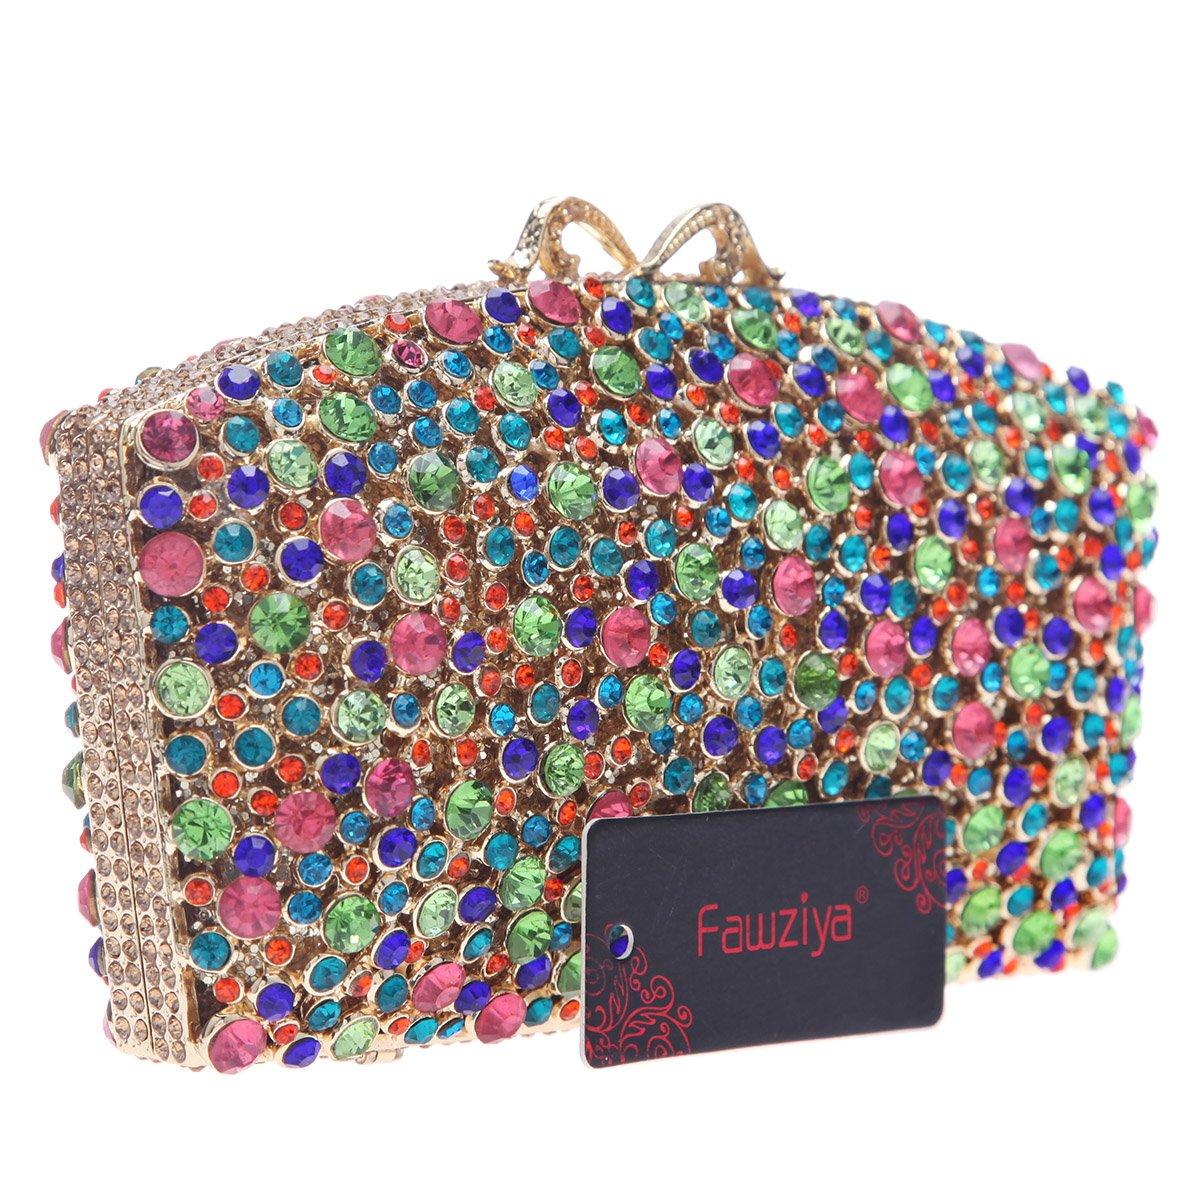 Amazon.com: fawziya Bling Colorful Diamond Embrague Bolso ...